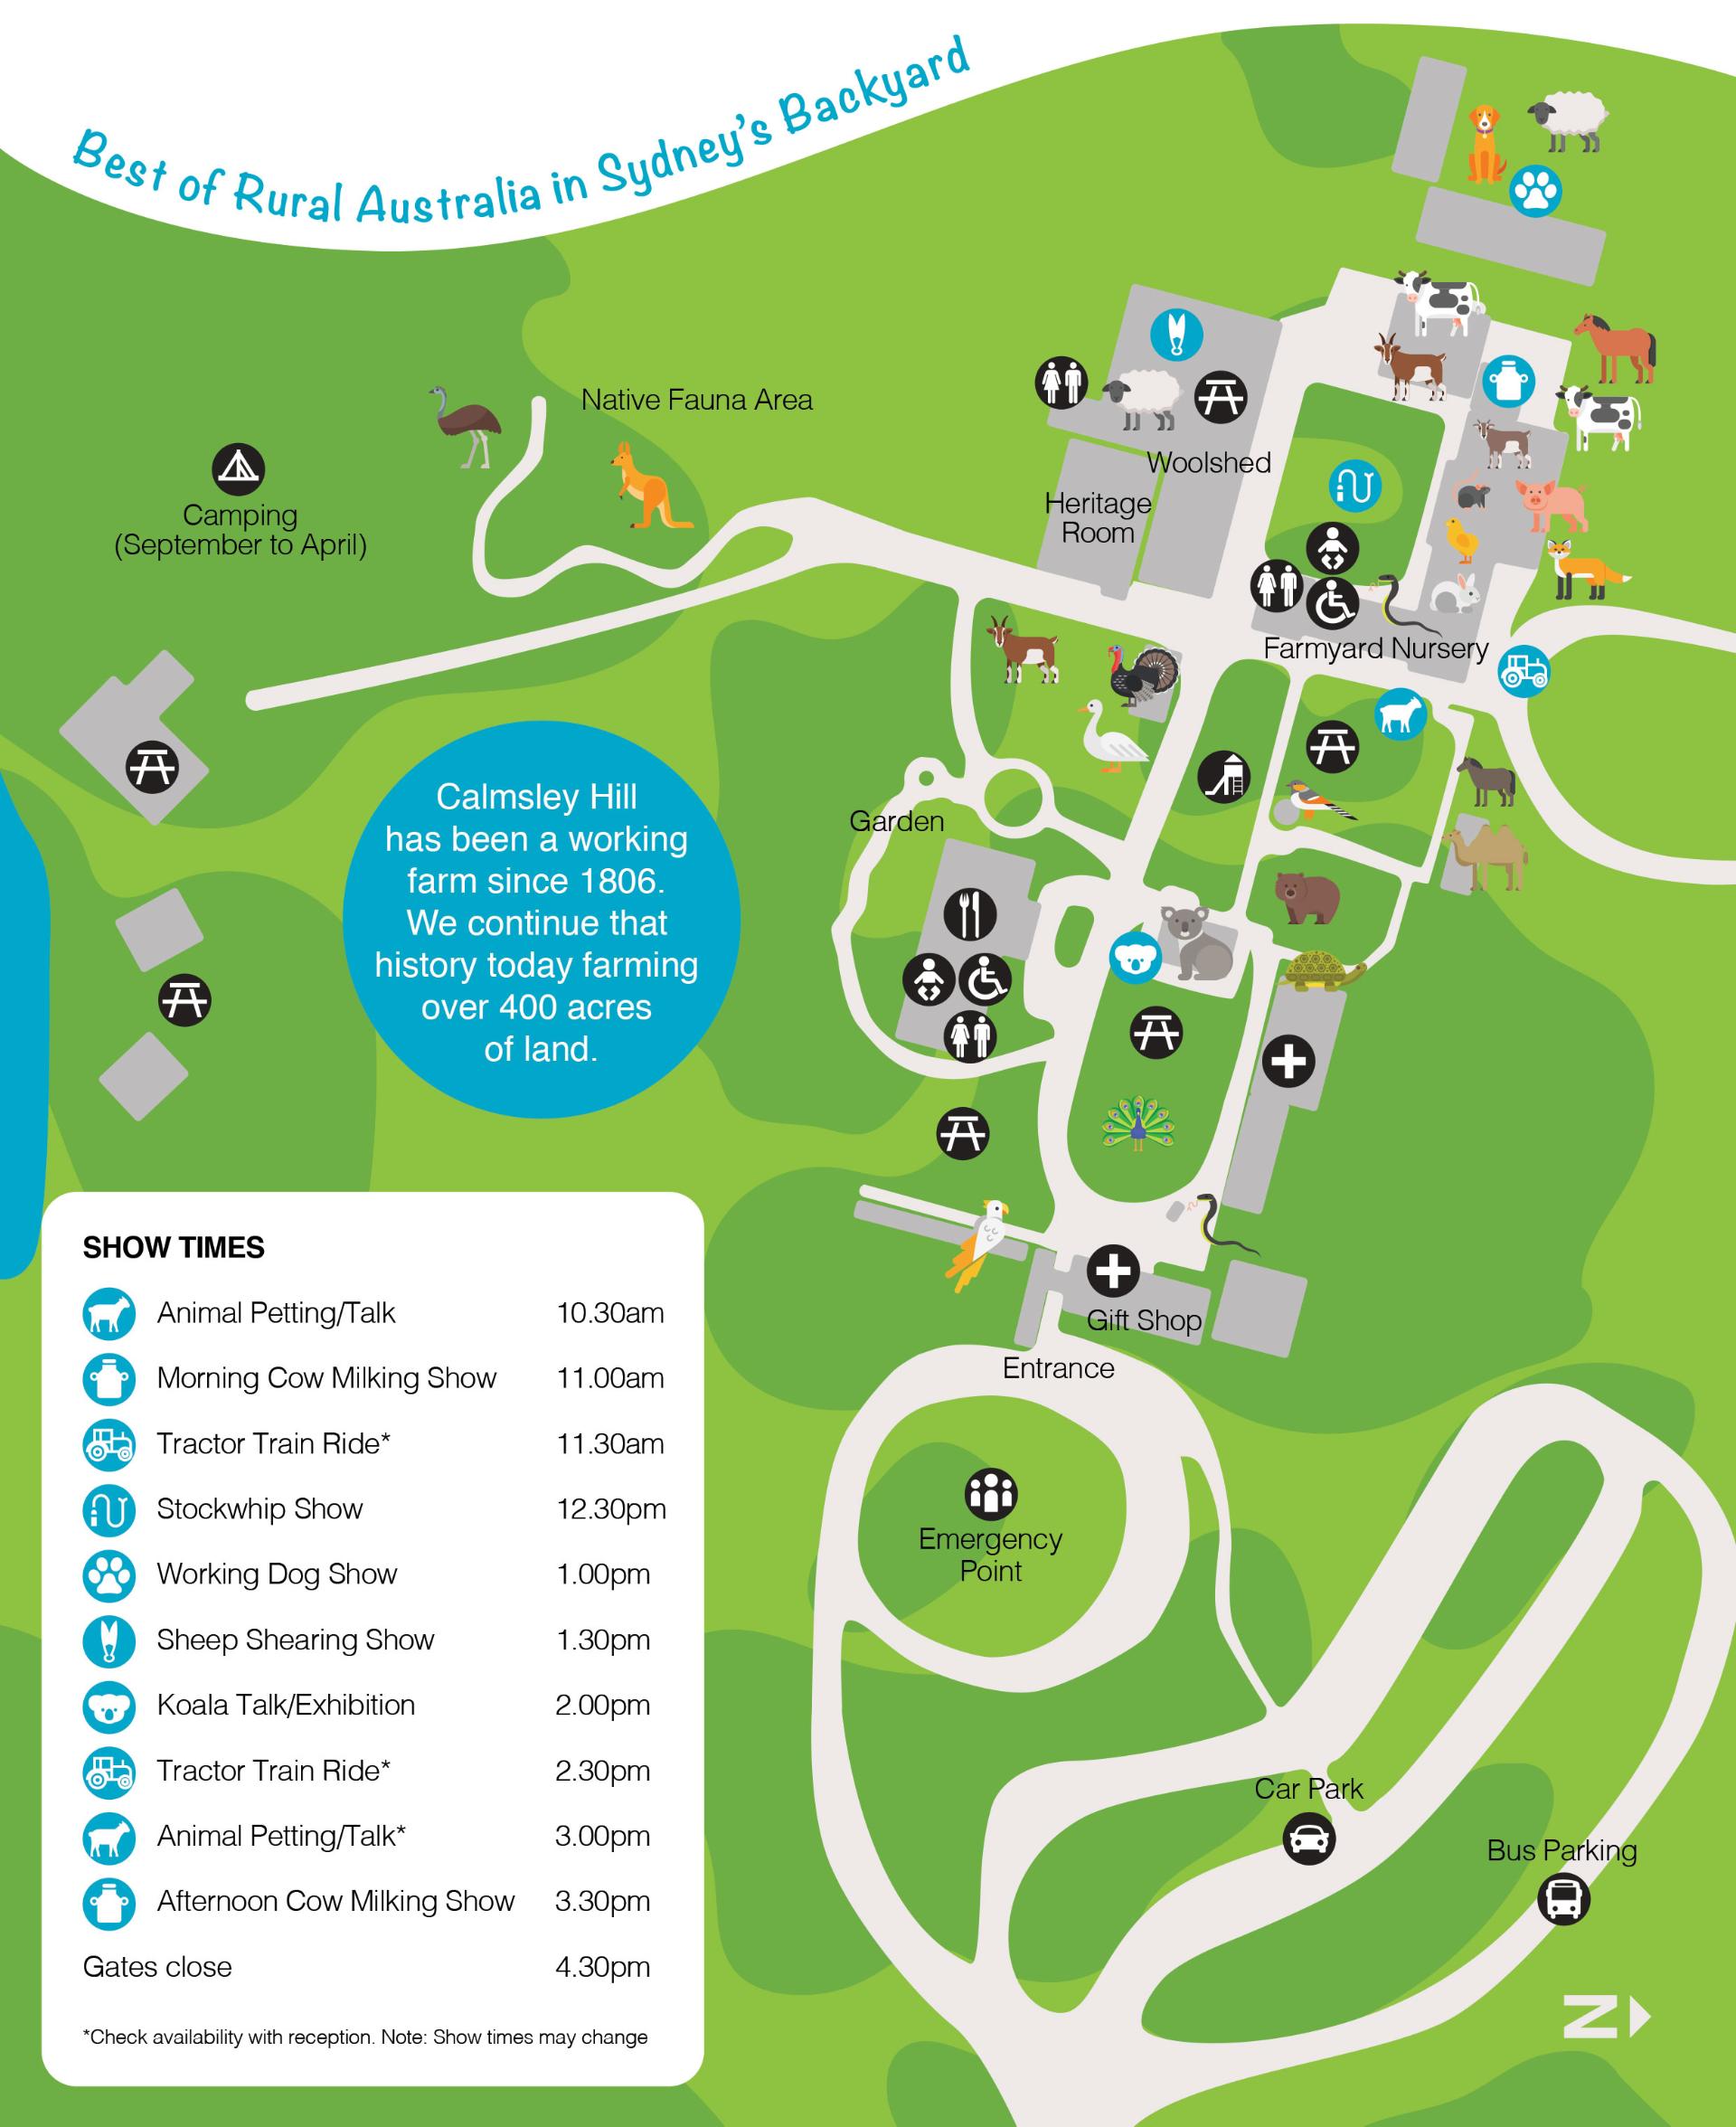 Calmsley Hill City Farm Map